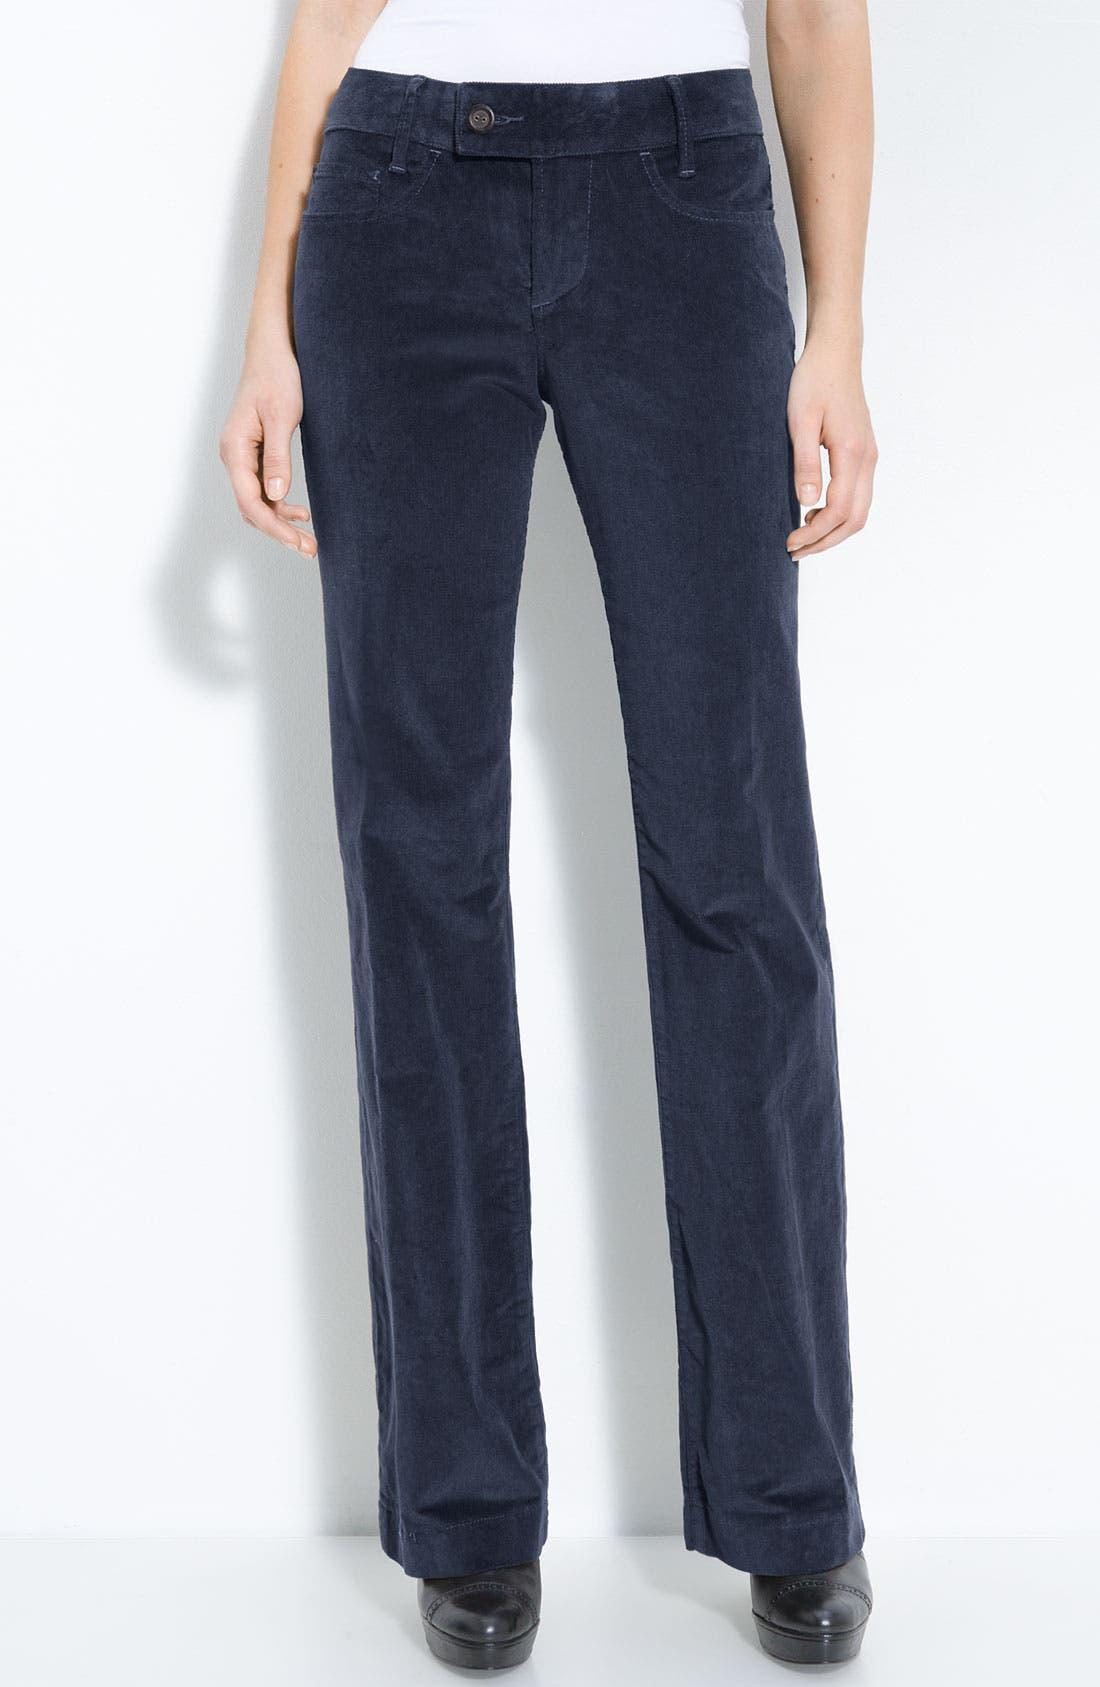 Main Image - Jag Jeans 'Jewel' Corduroy Trousers